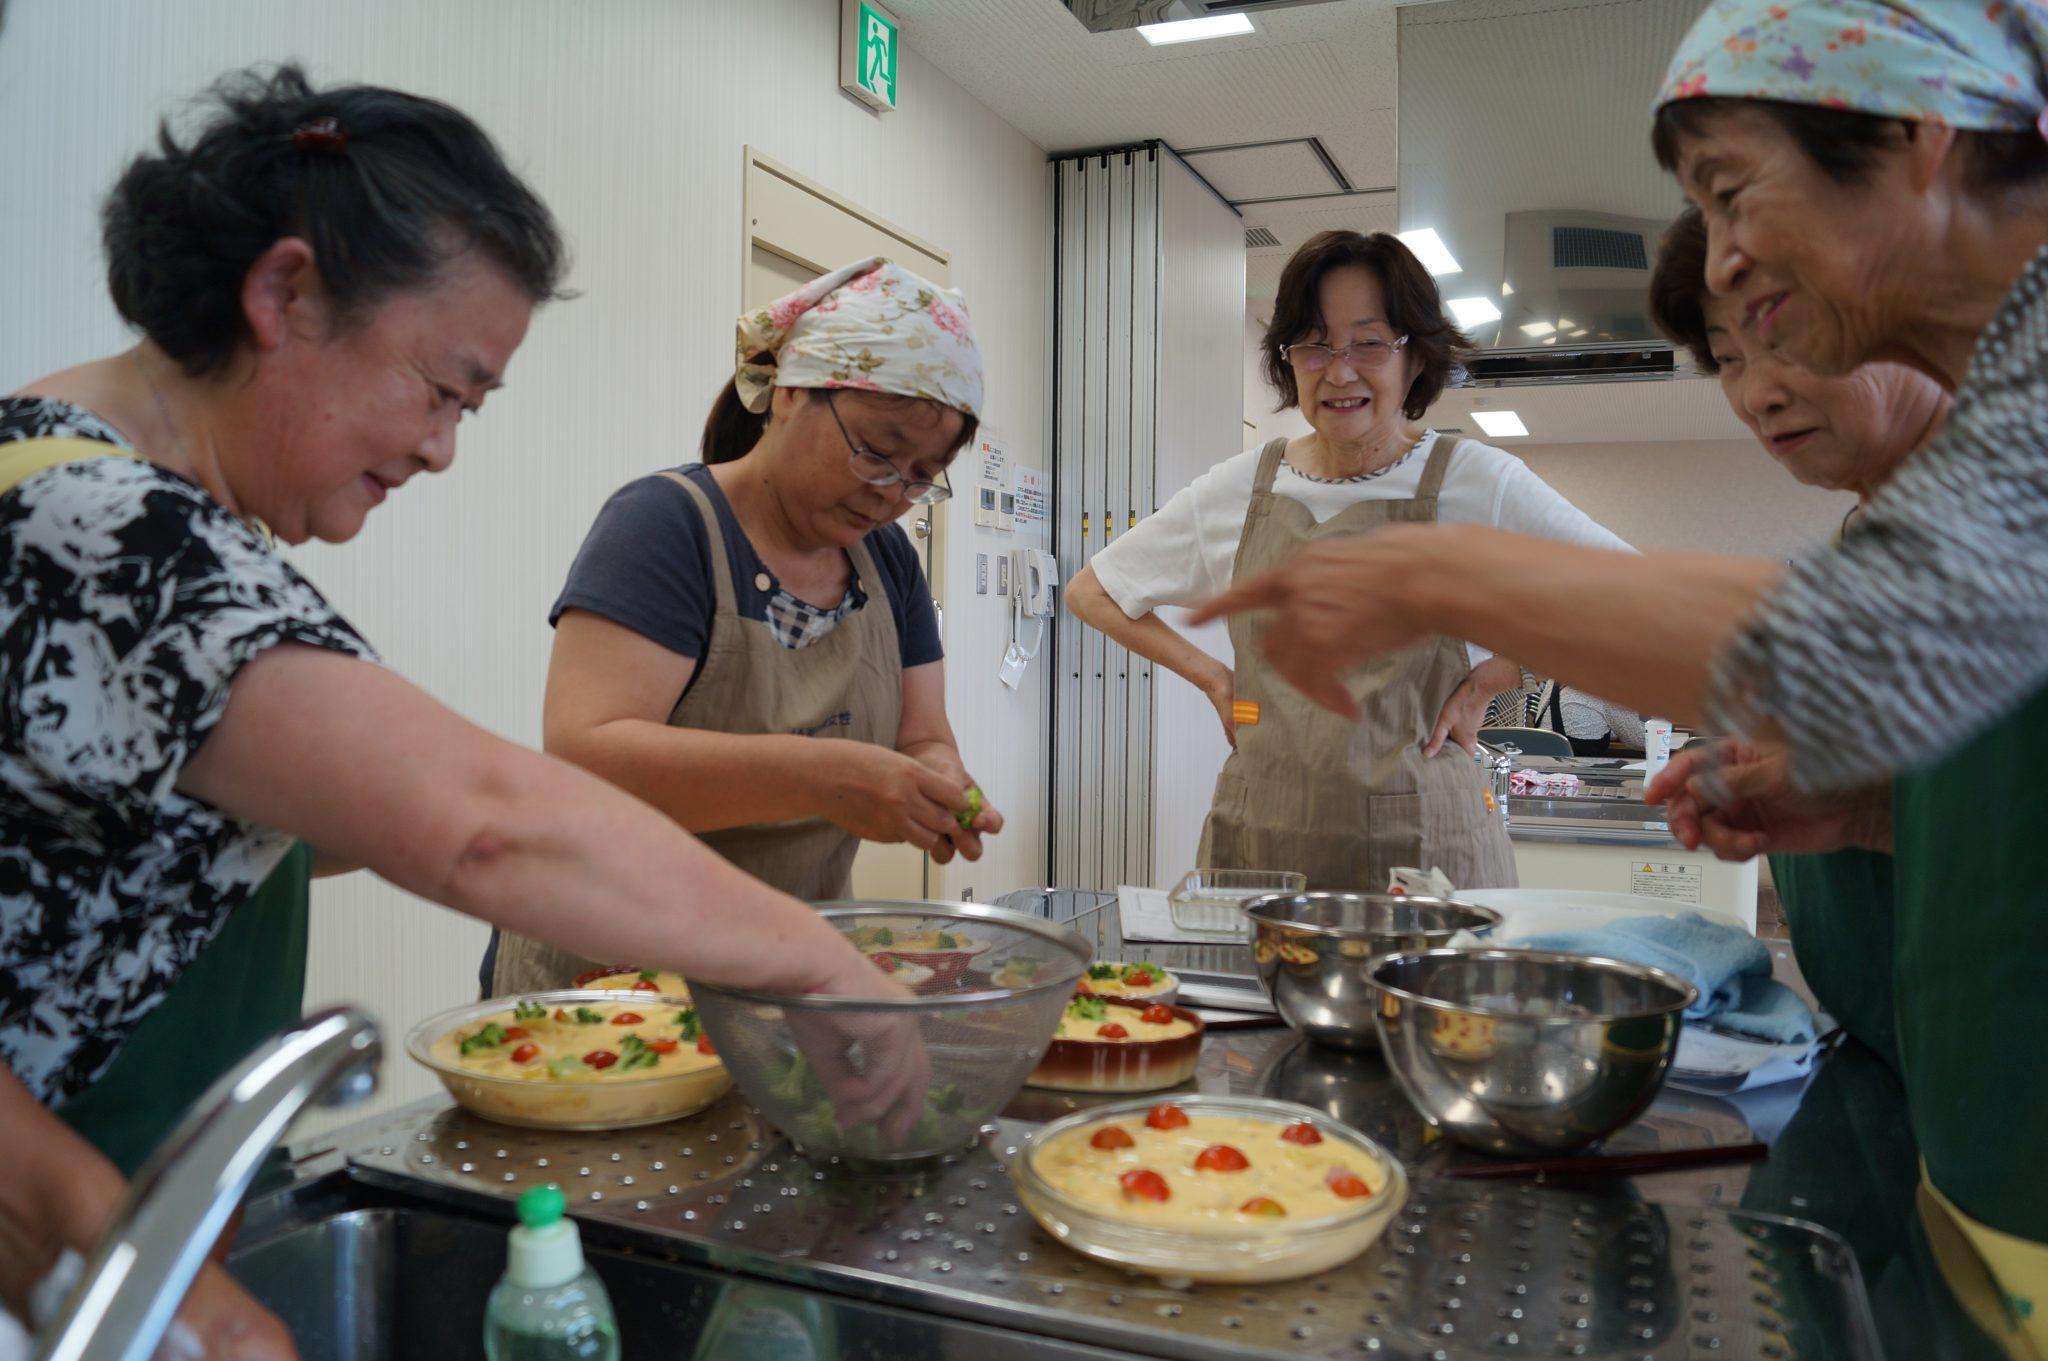 JA 海部東農業協同組合(あまひがし) -夏野菜を取り入れた料理を作ろう